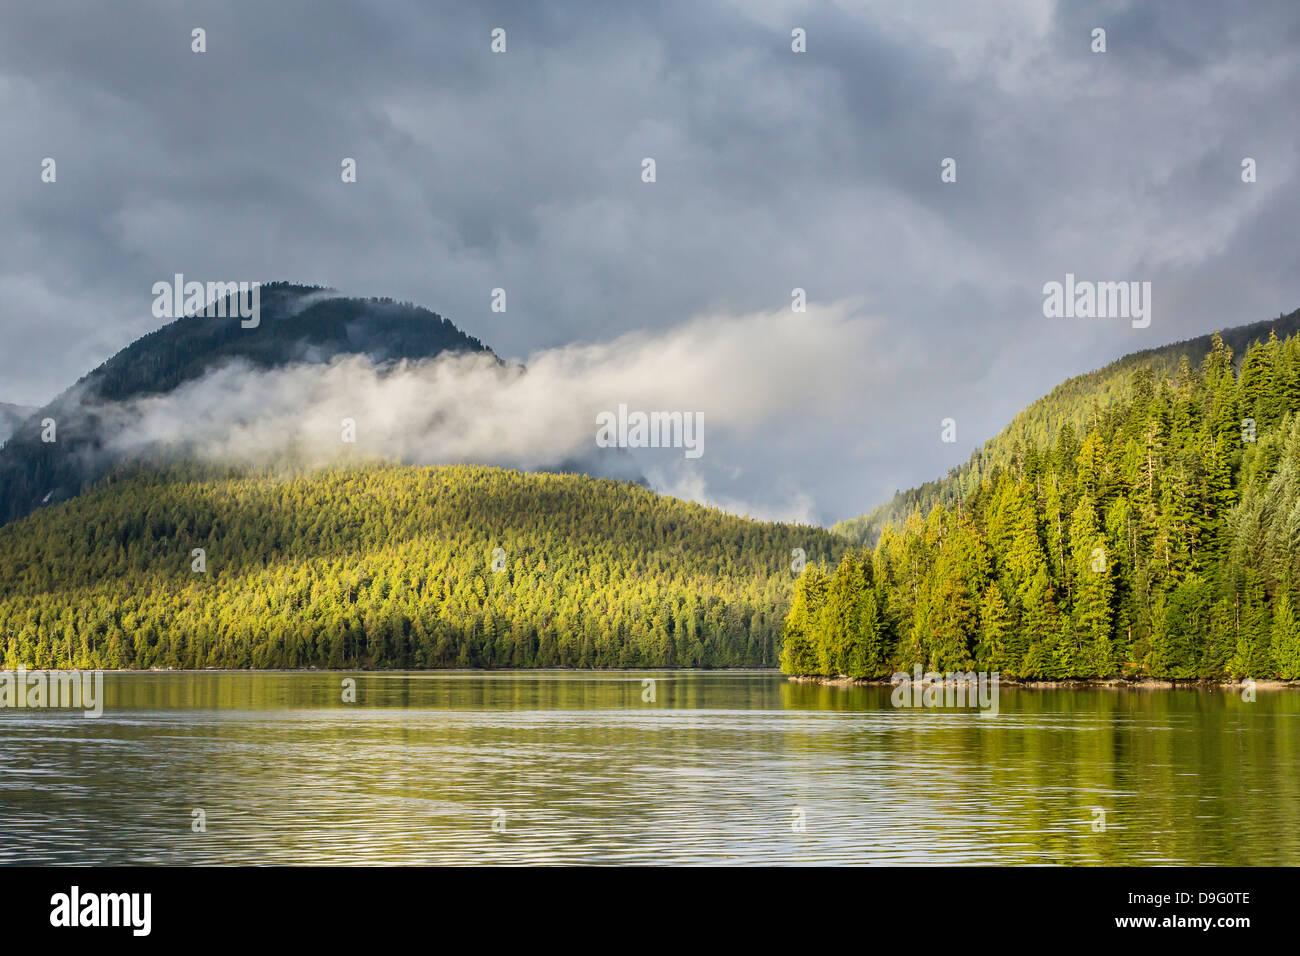 Fog-shrouded forest near Juneau, Southeast Alaska, USA - Stock Image